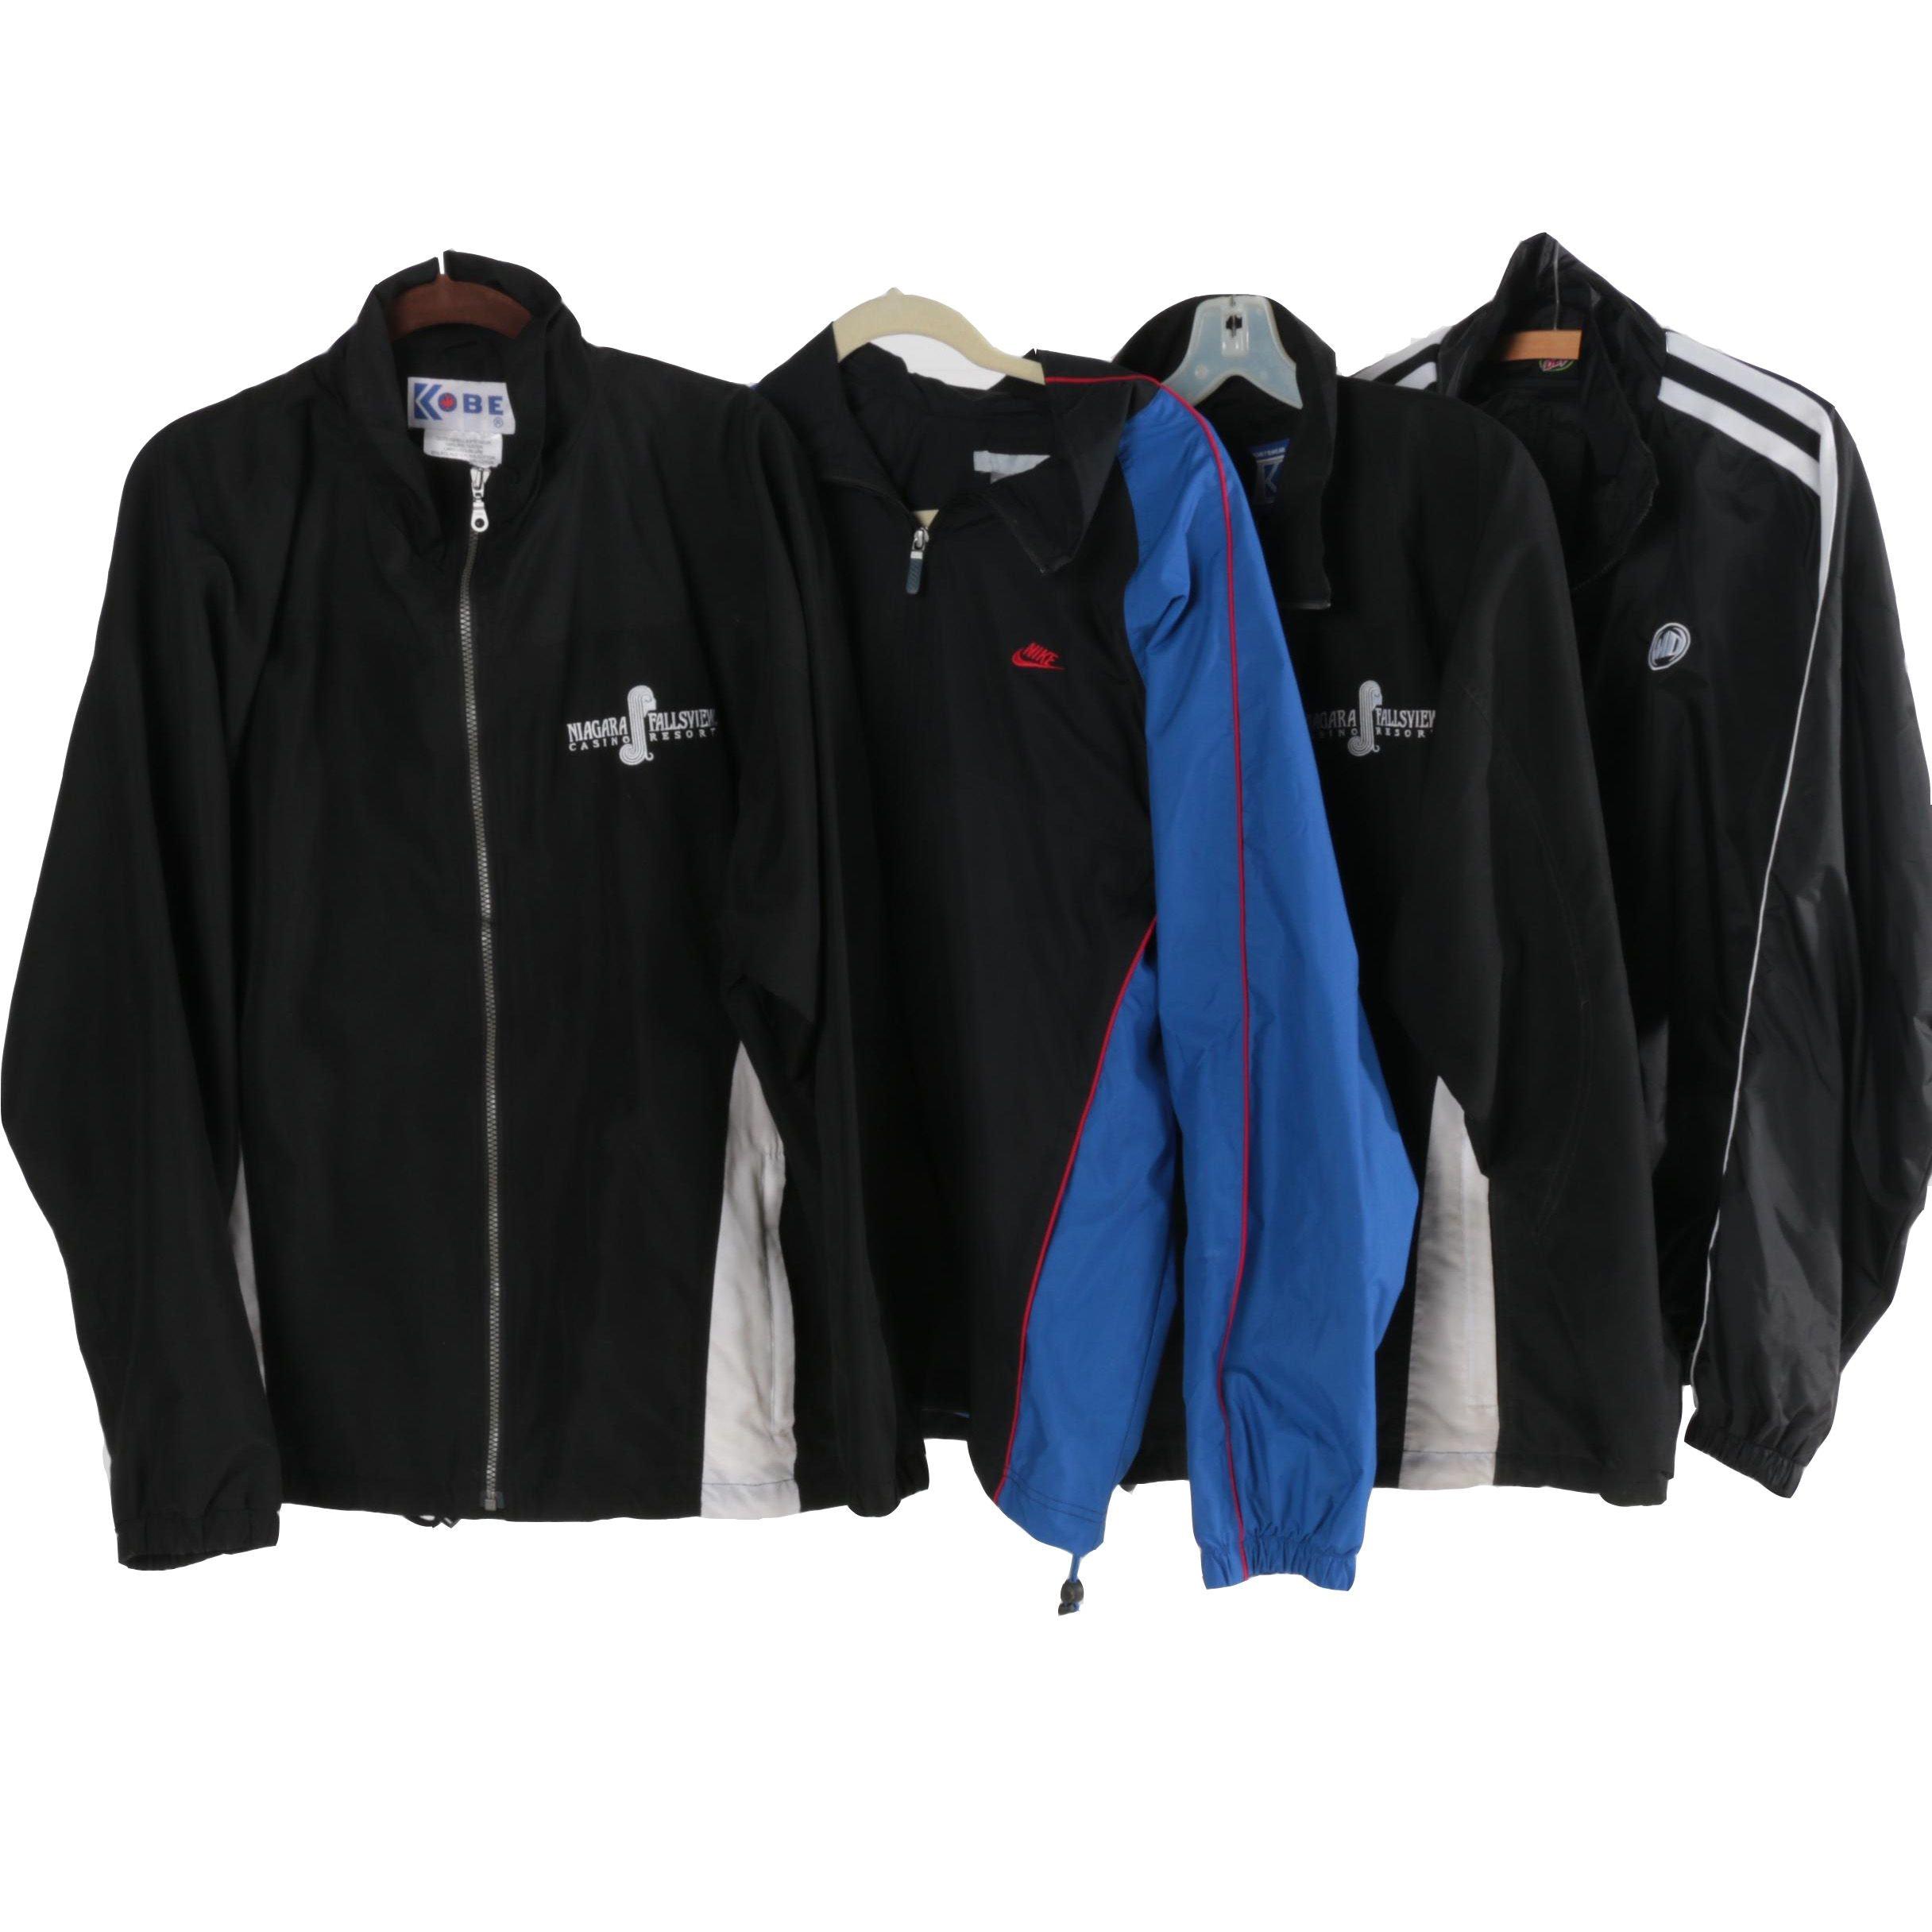 Men's Jackets Including Nike